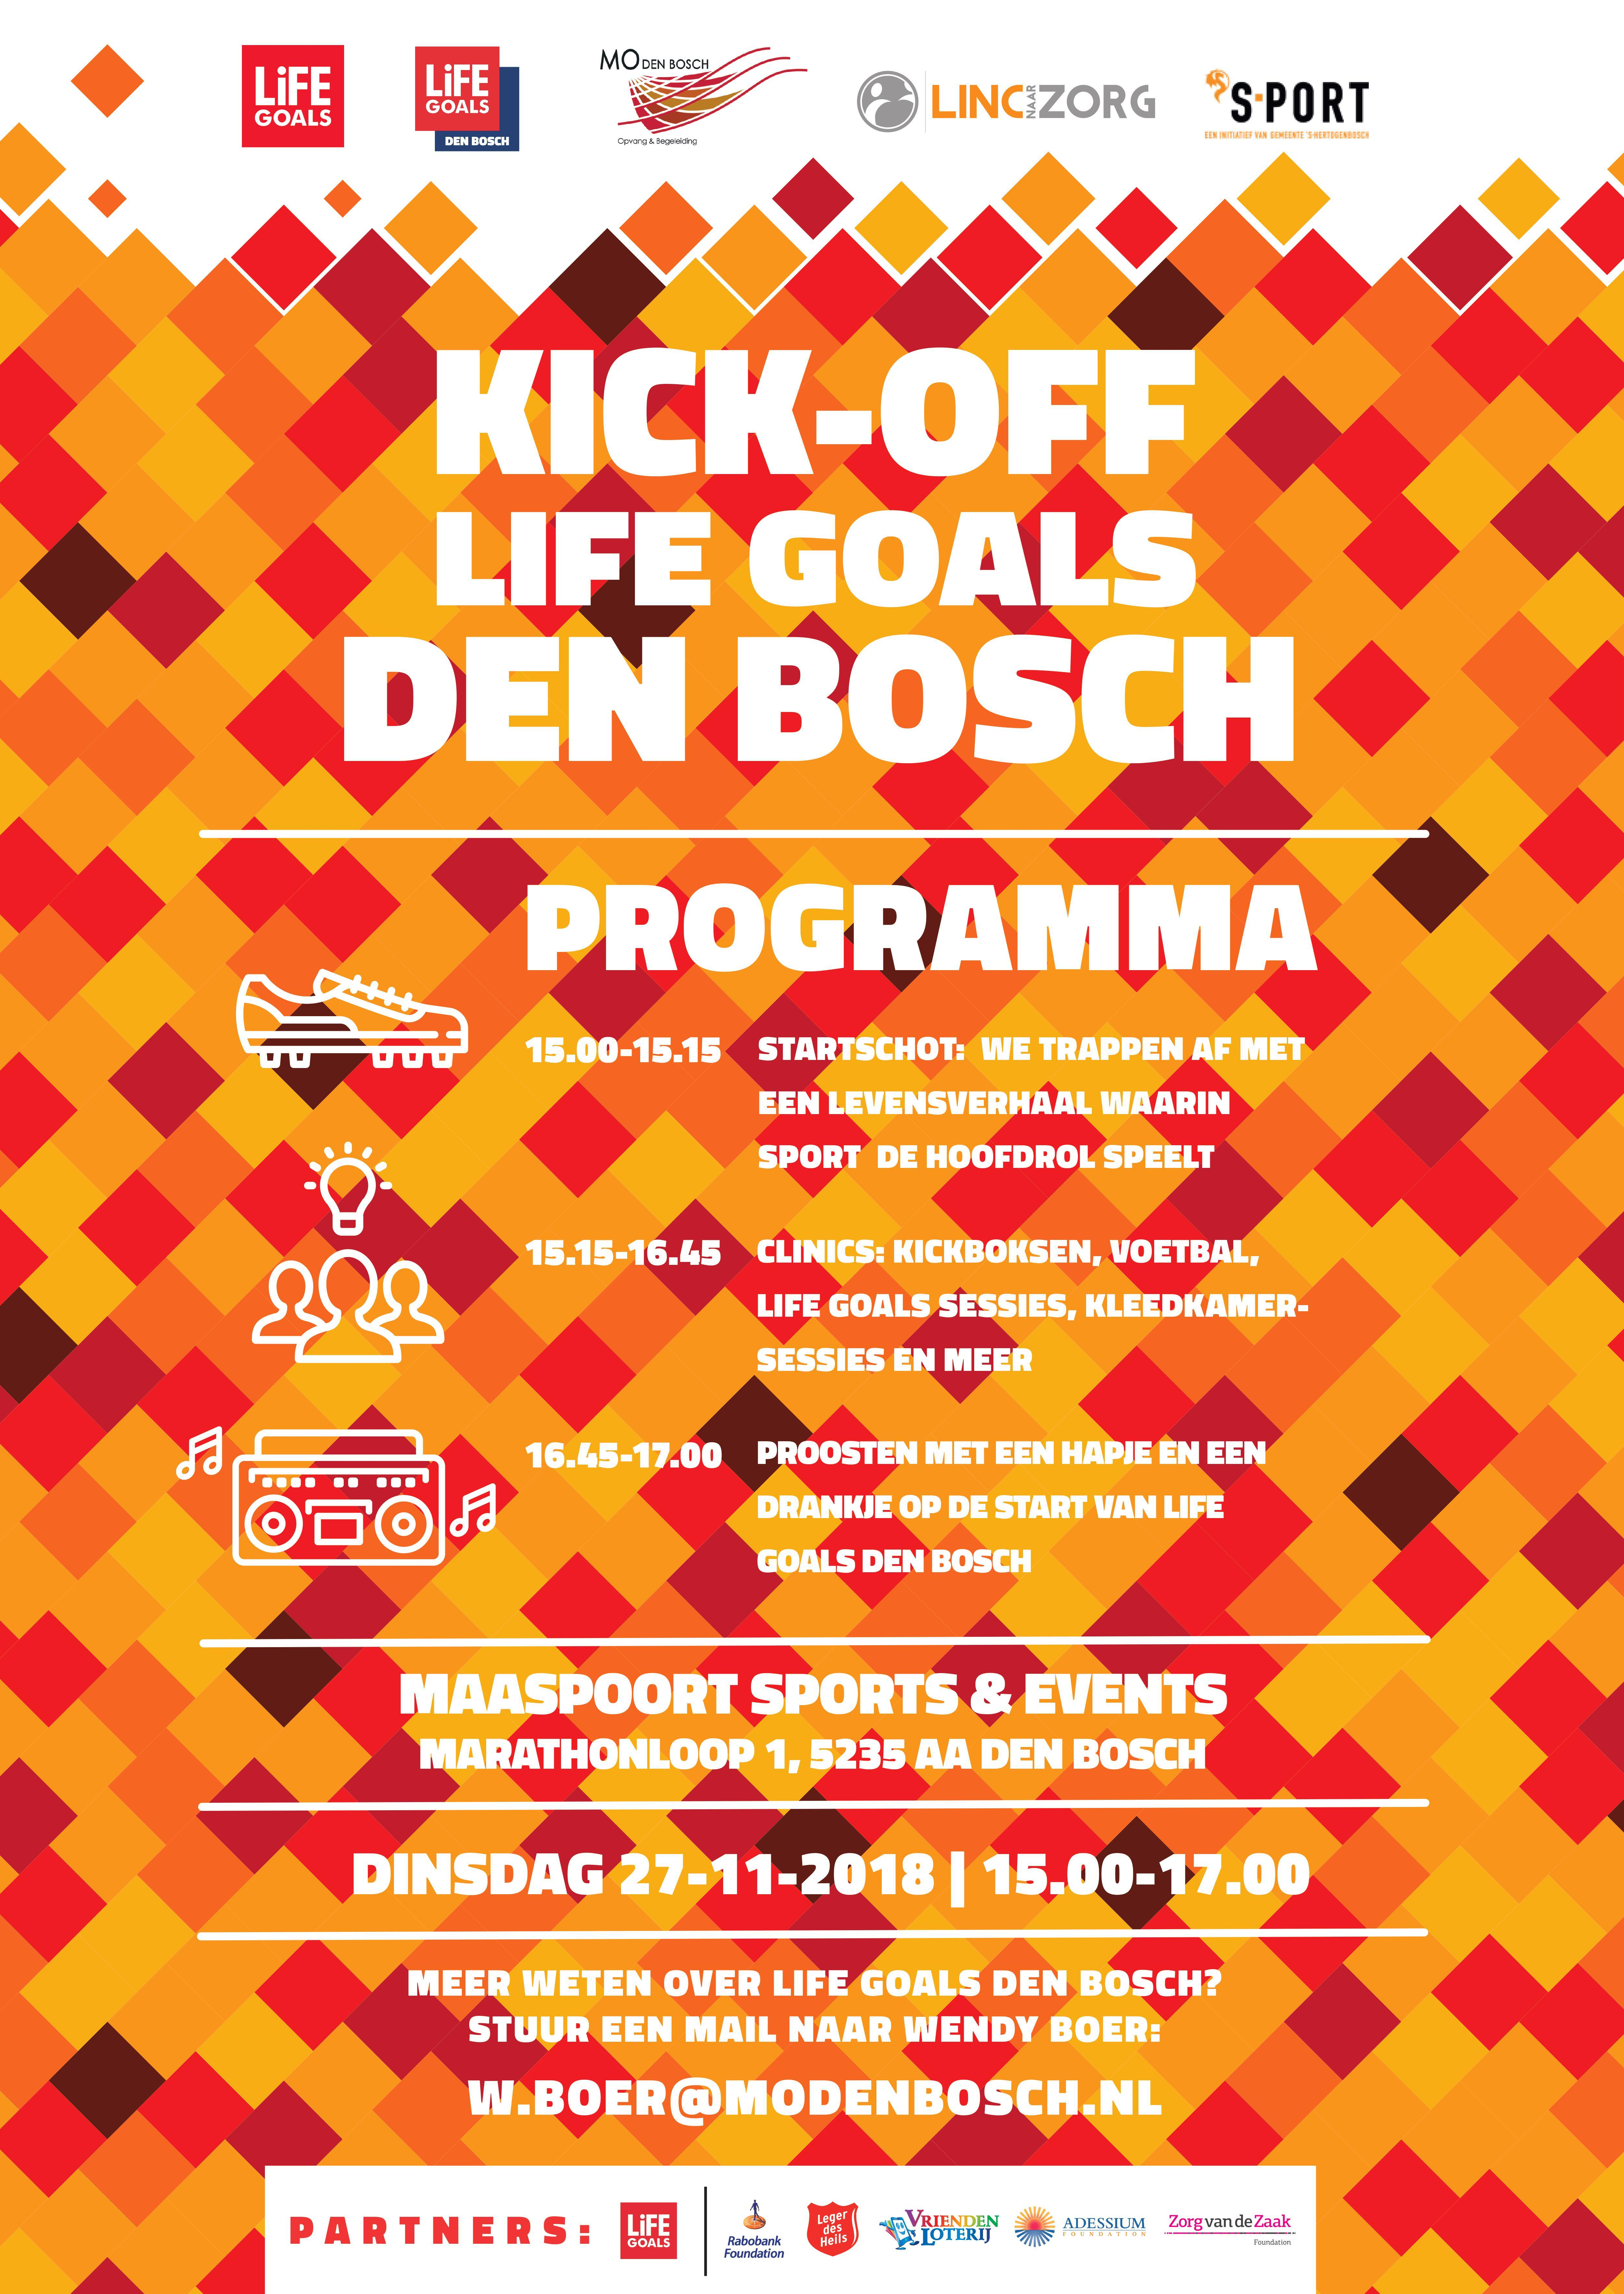 Kickoff Life Goals Den Bosch